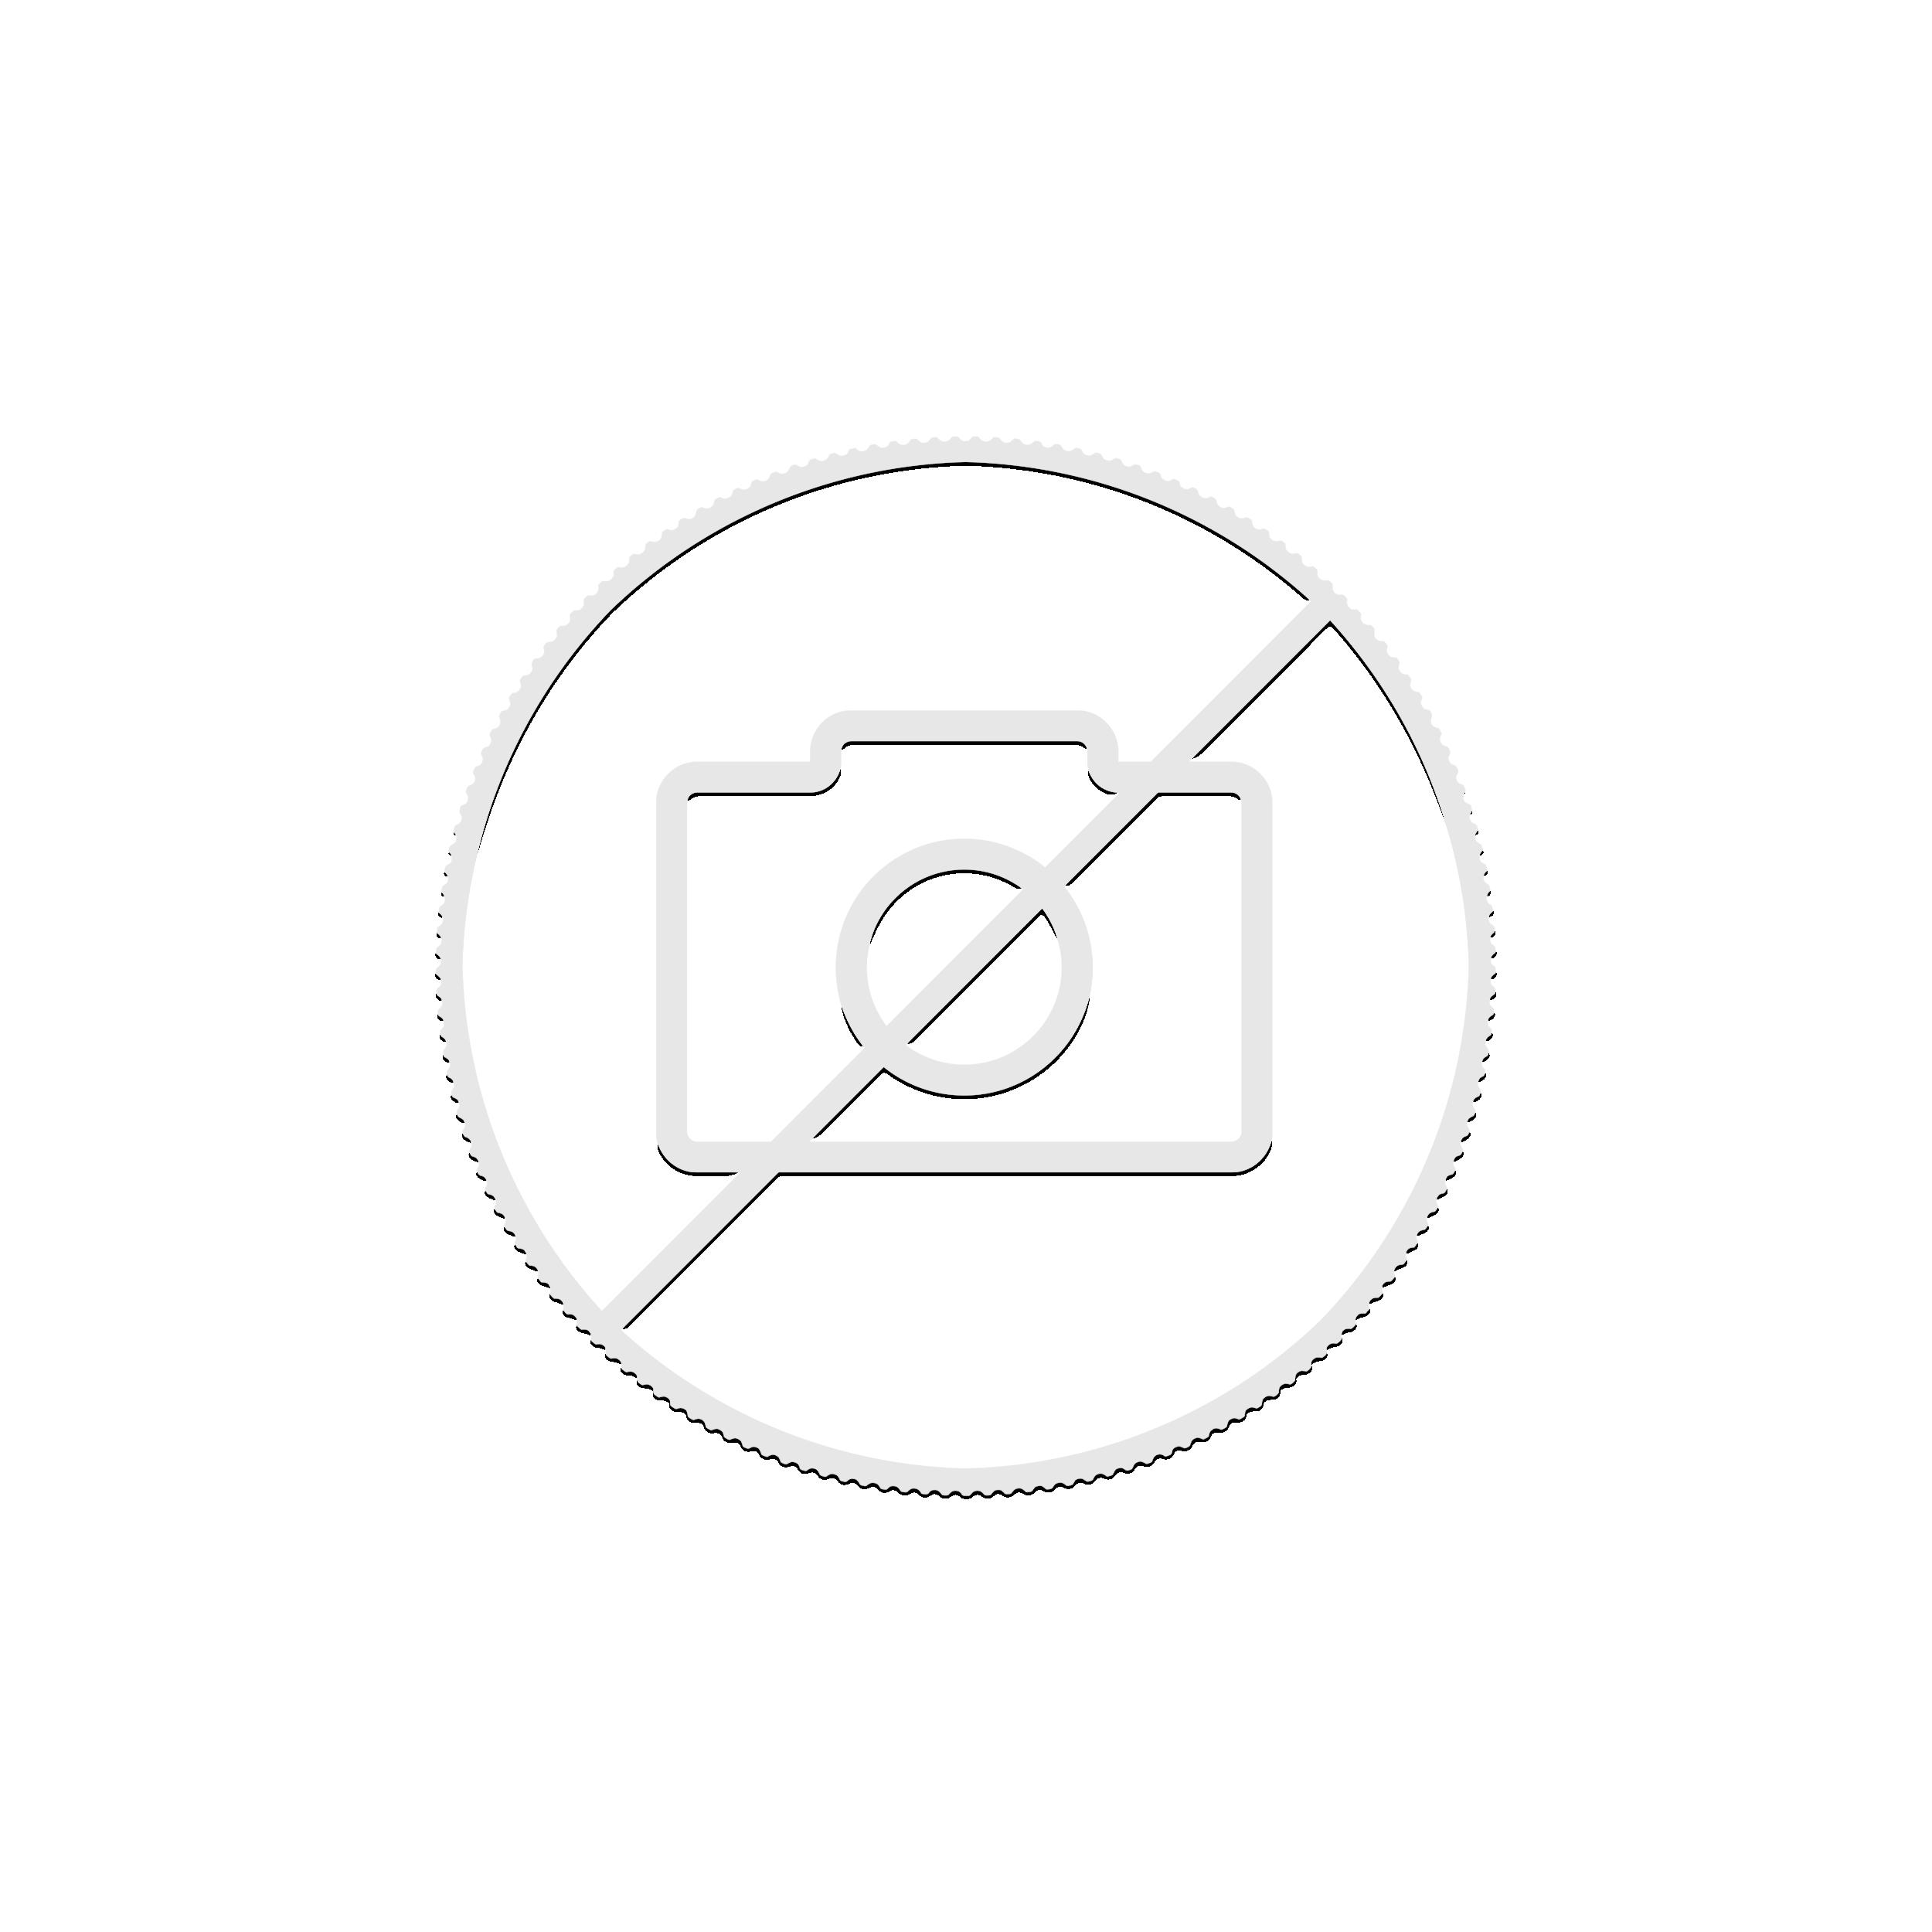 1 troy ounce zilveren munt Panda golden ring 2021